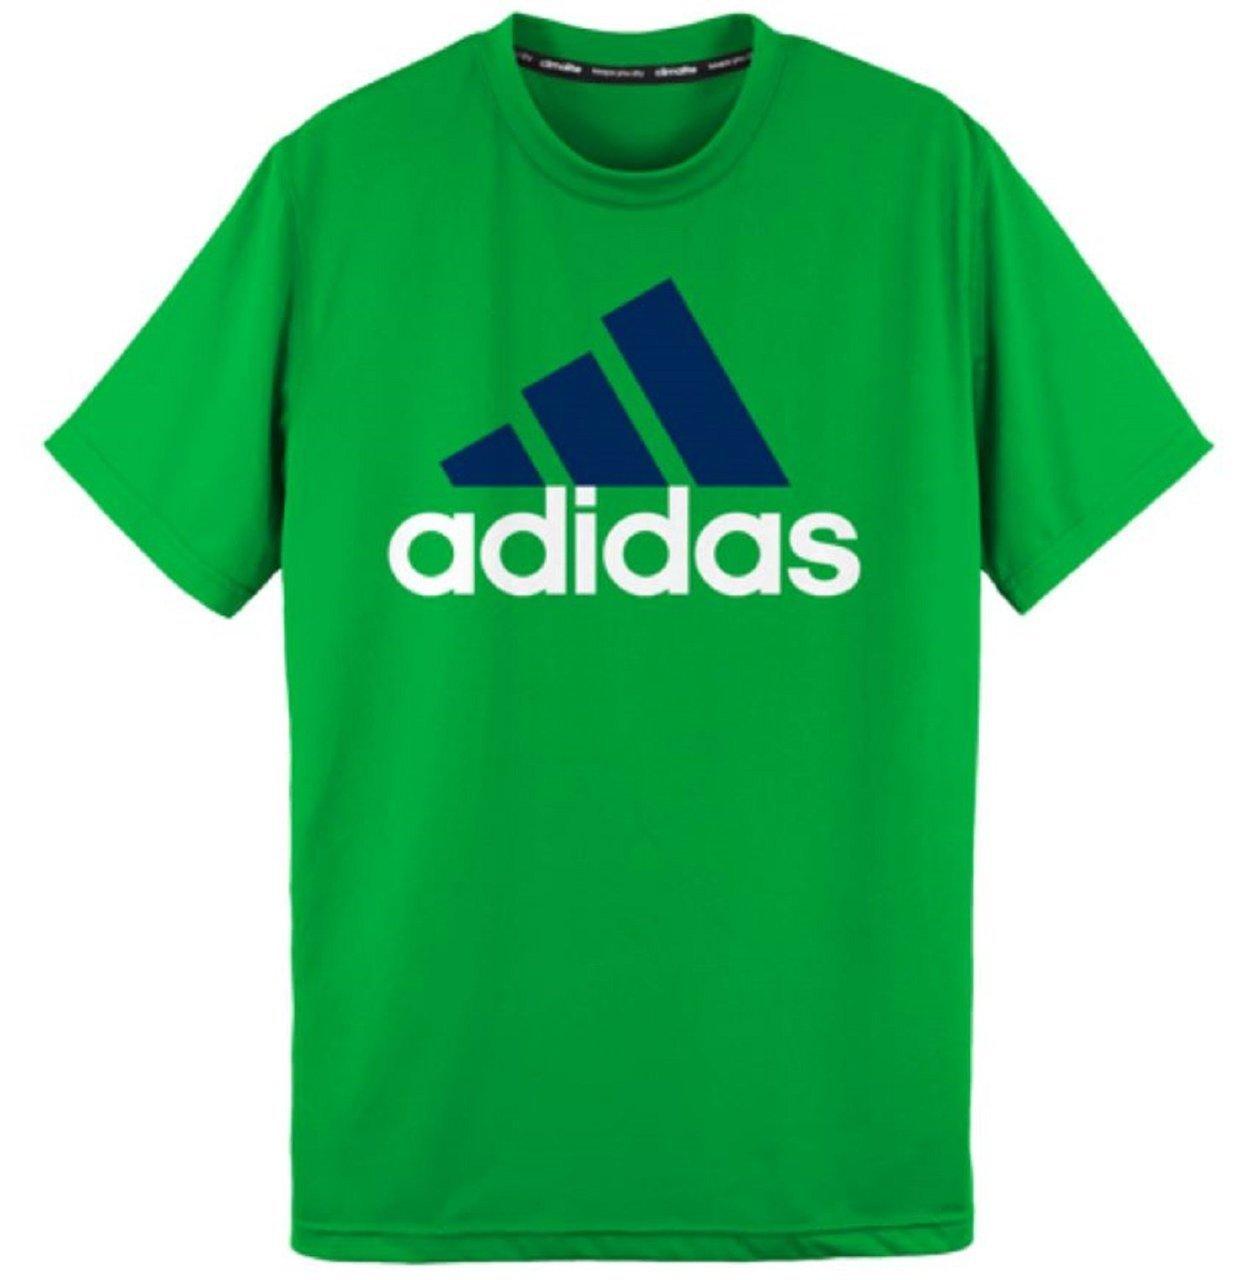 adidas Youth Big Boys Brand Logo Shirt (X-Large/18, Slime Green)